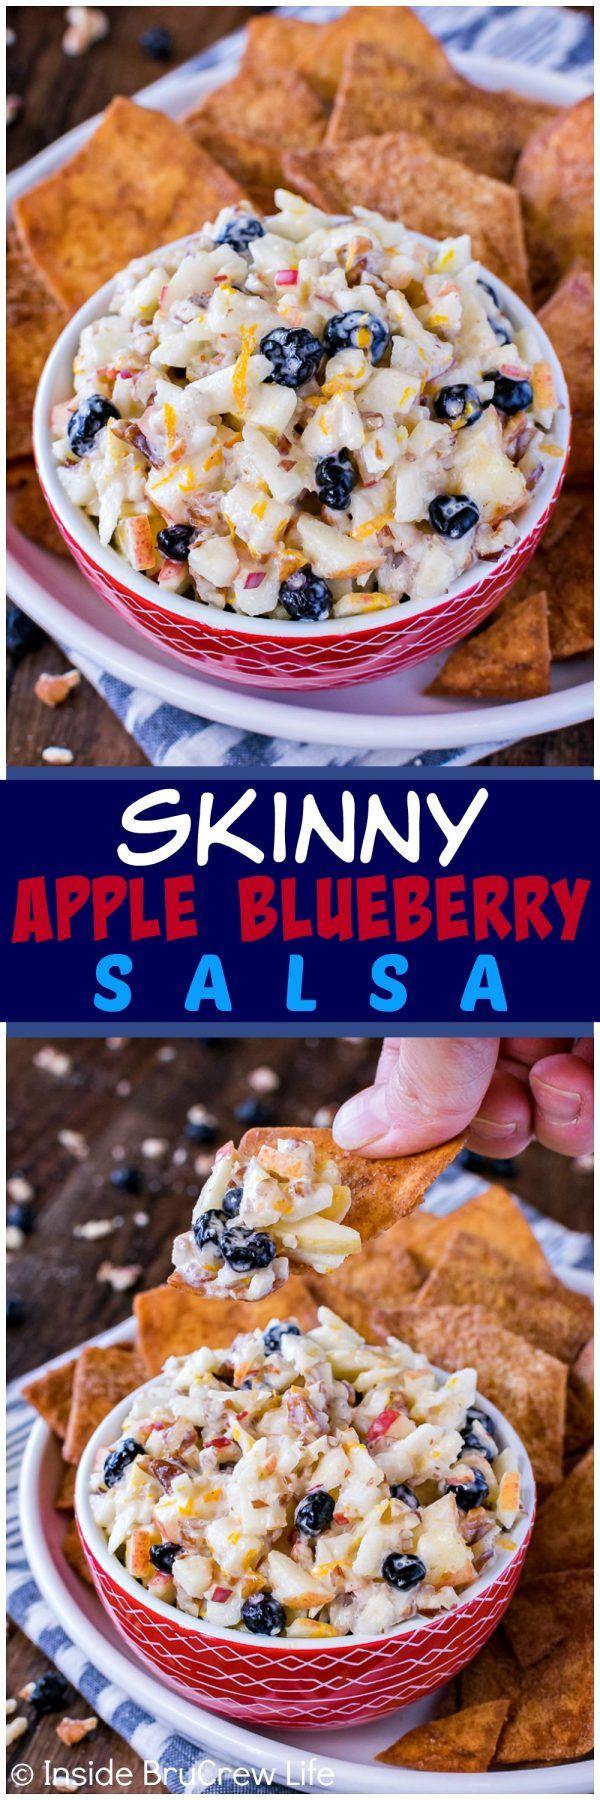 25+ best Summer meal ideas on Pinterest | Summer dinner ideas, Simple ...